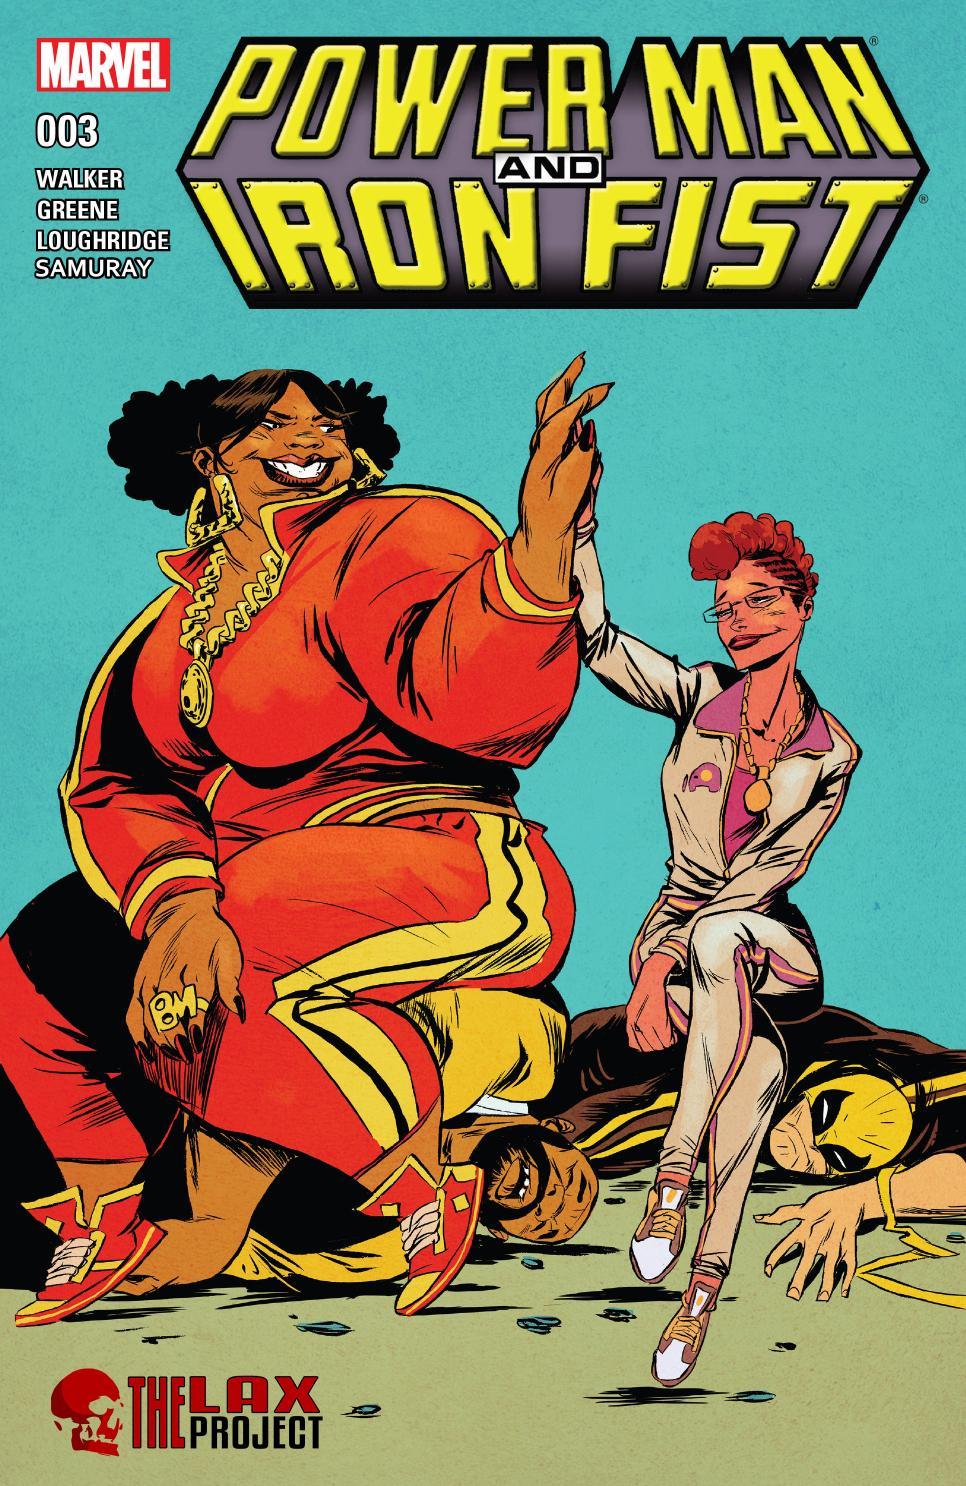 power man and iron fist comic - 647×1000